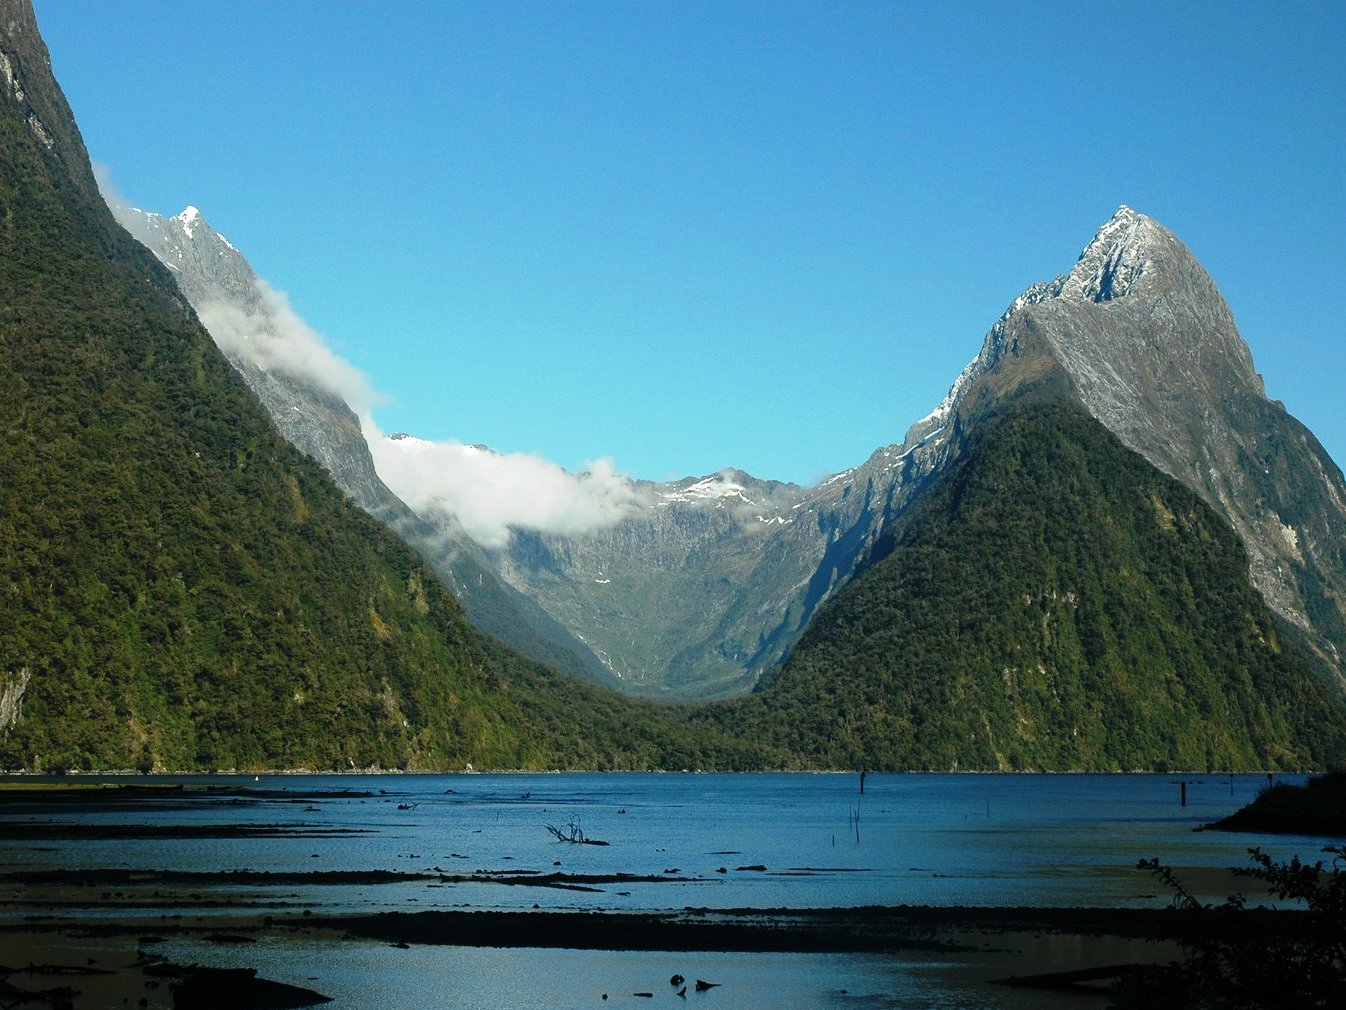 Amoklauf Neuseeland Video Pinterest: 1346 X